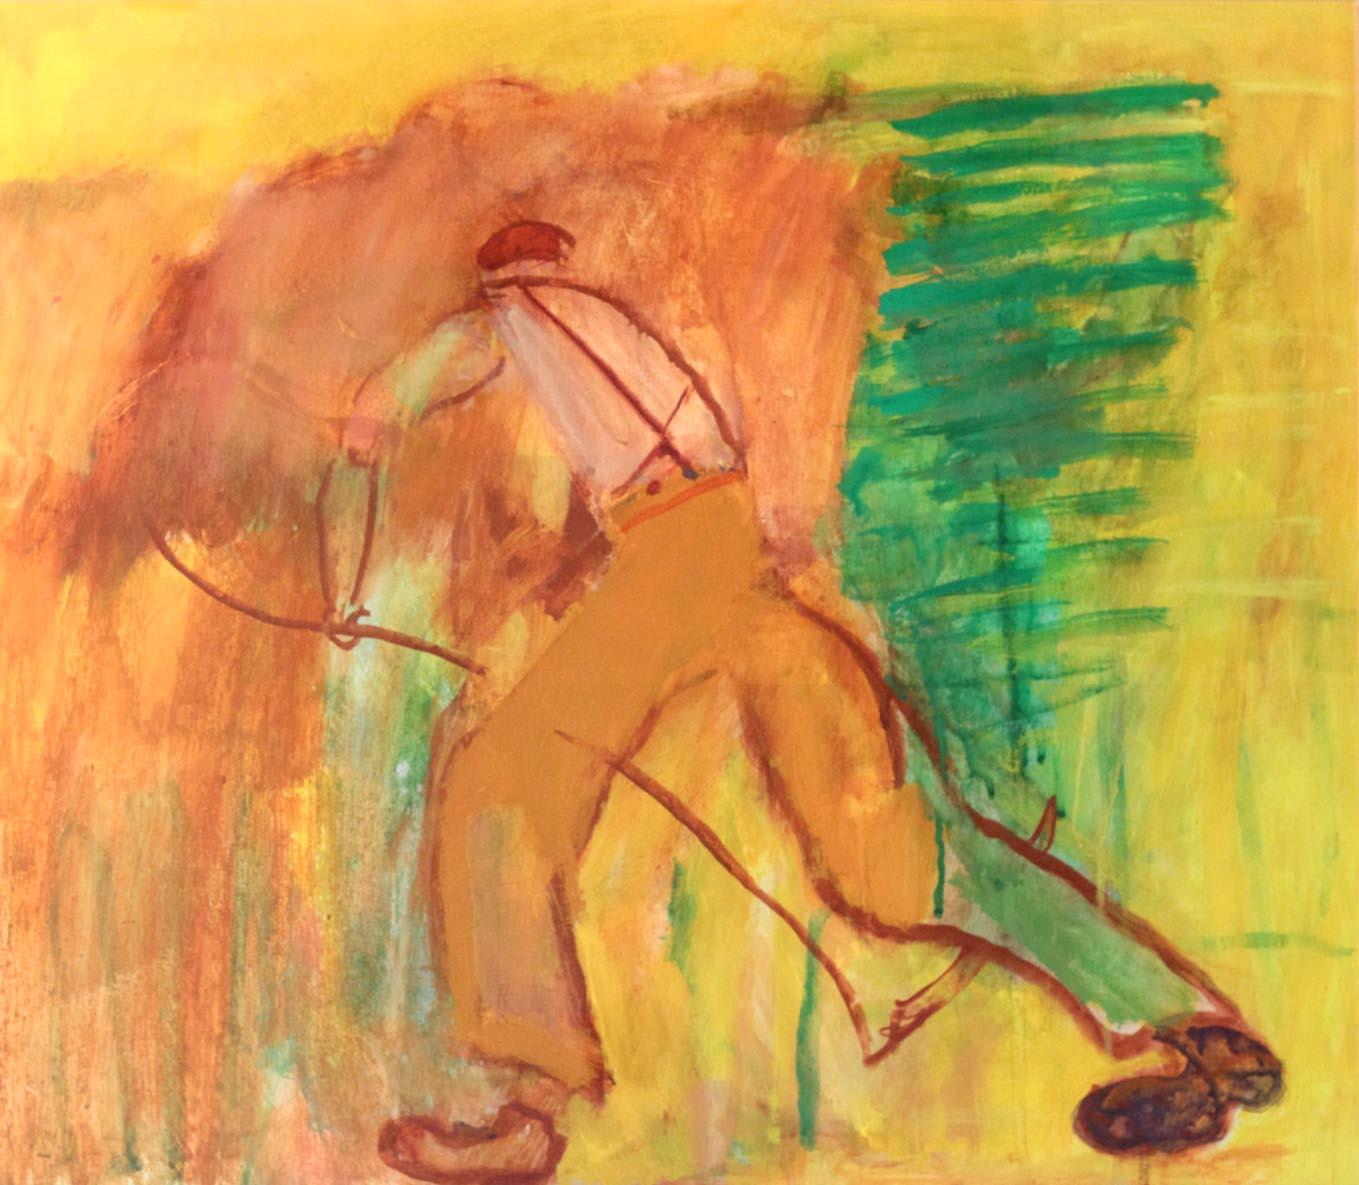 Ben Hartley Scything Gesso on Paper 52 x 59 cm.